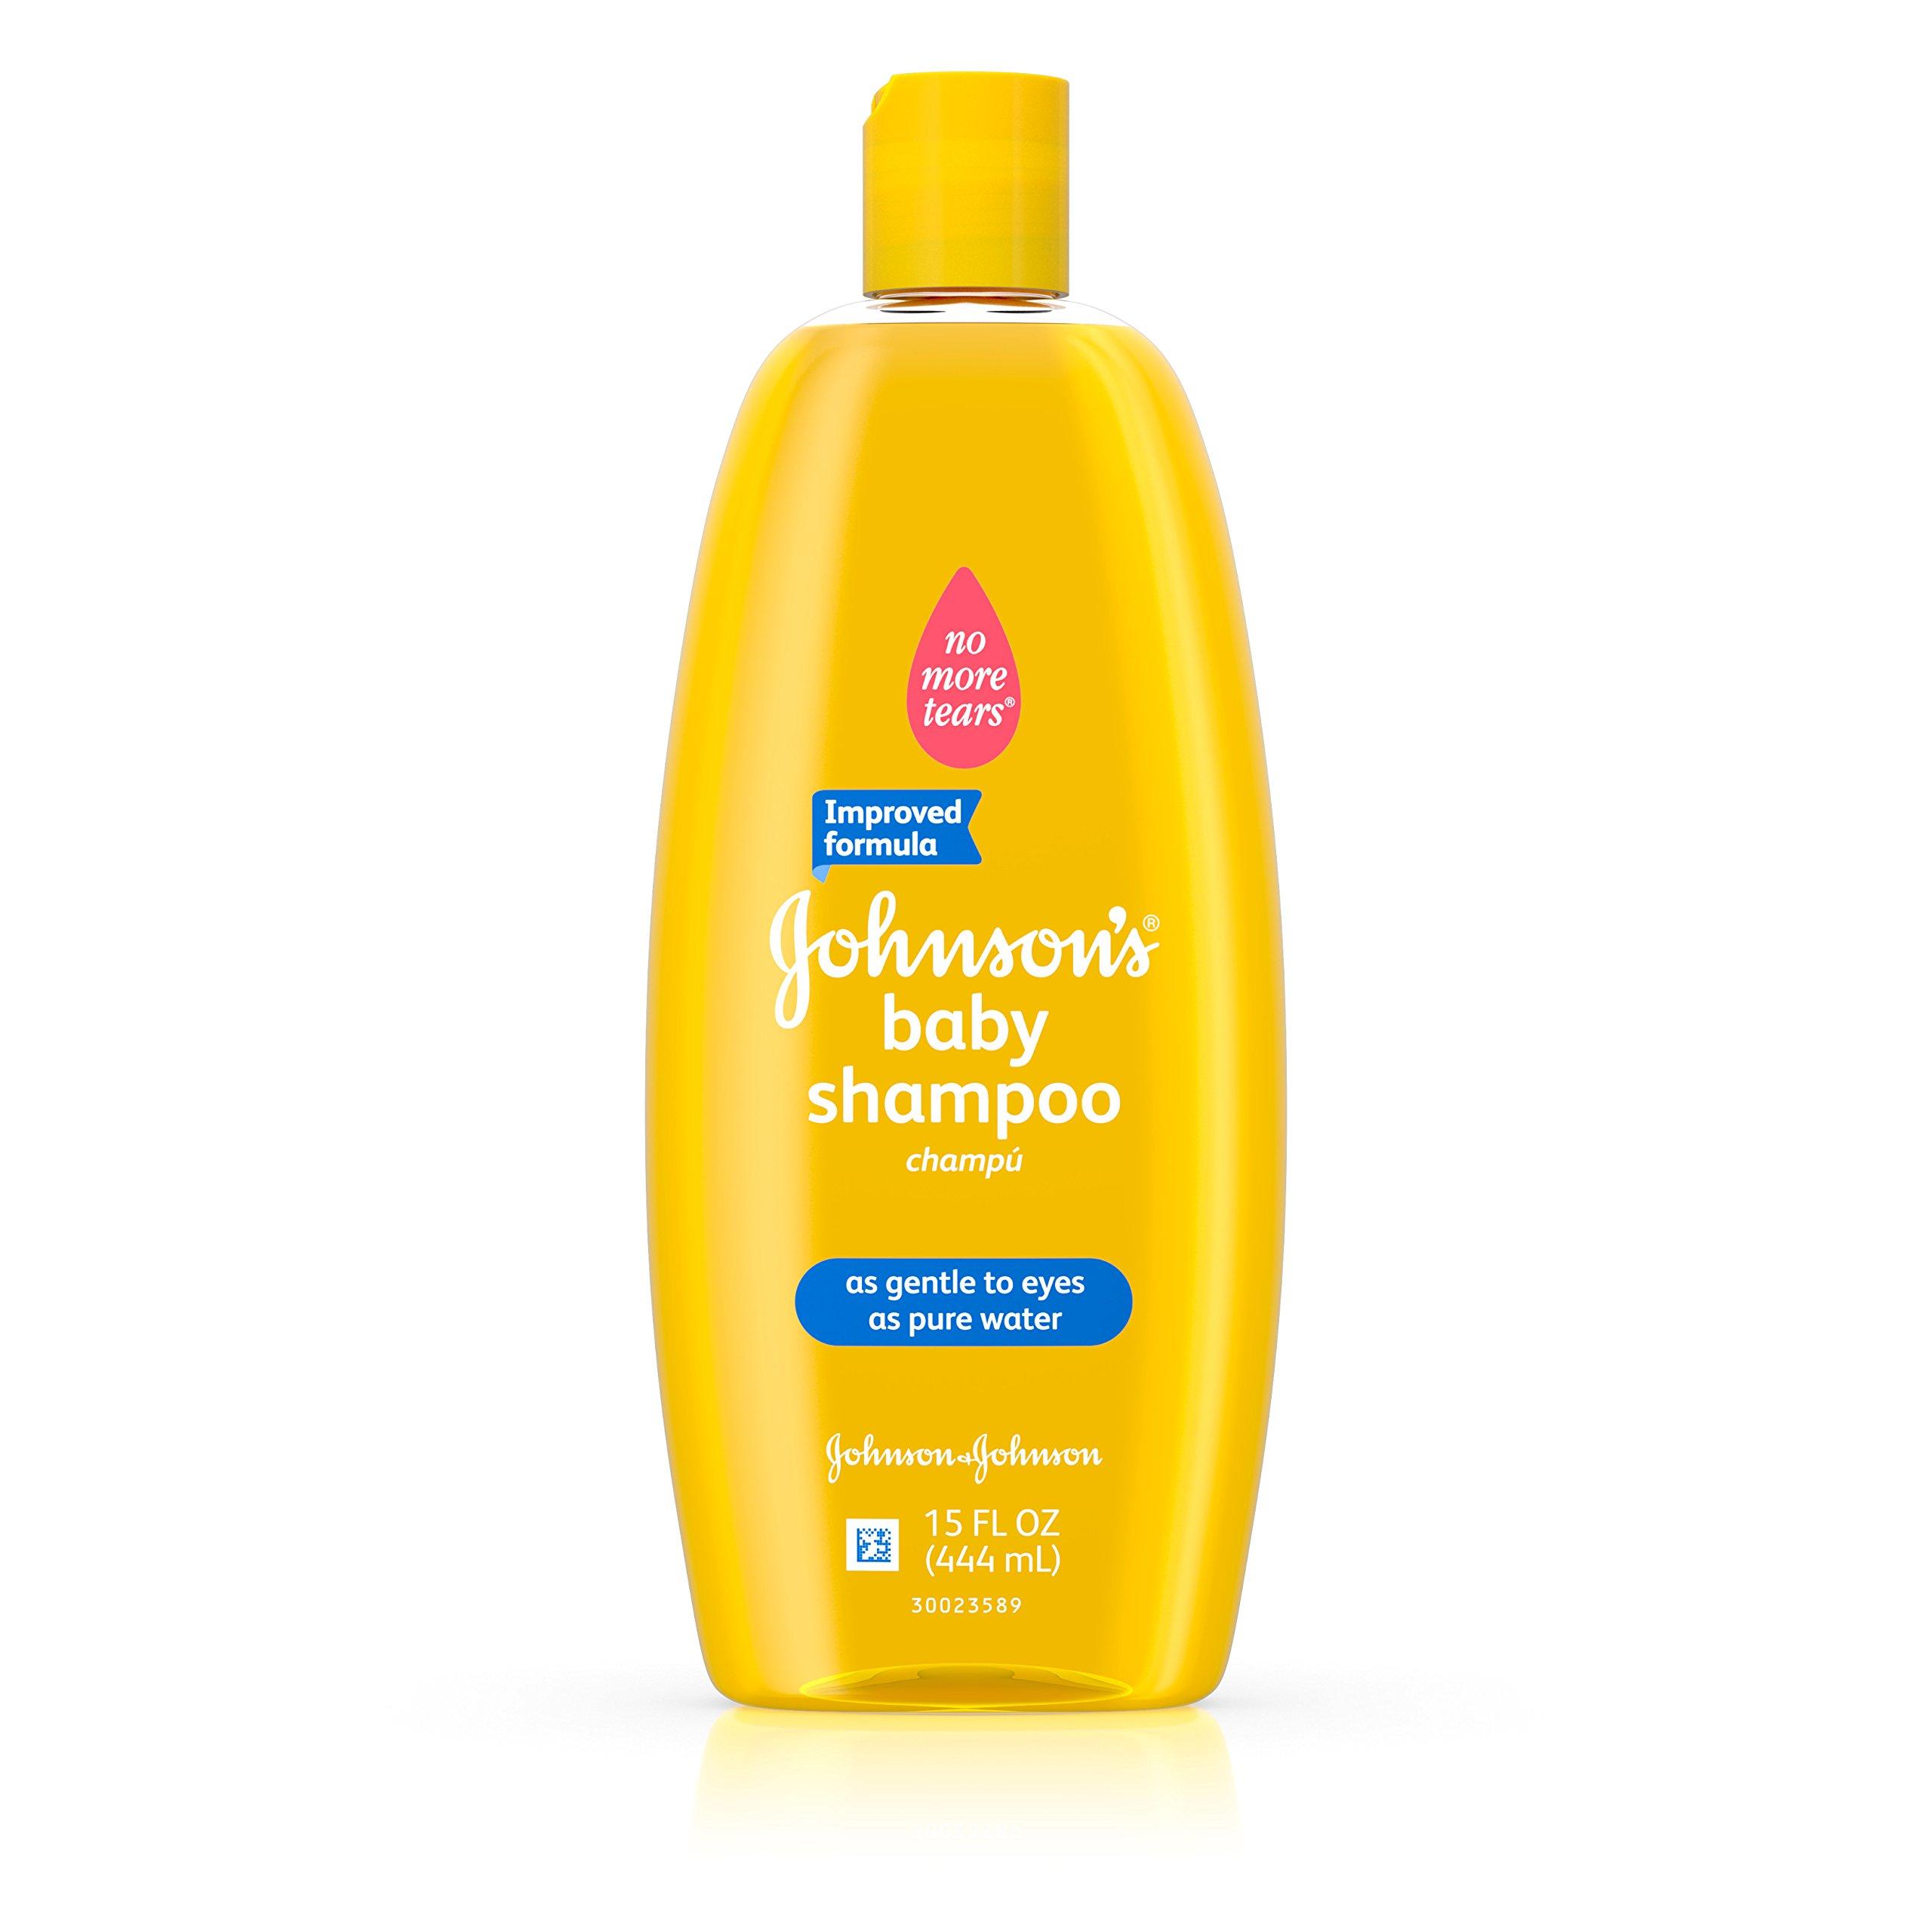 Johnson's Baby Shampoo, 15 Fl. Oz